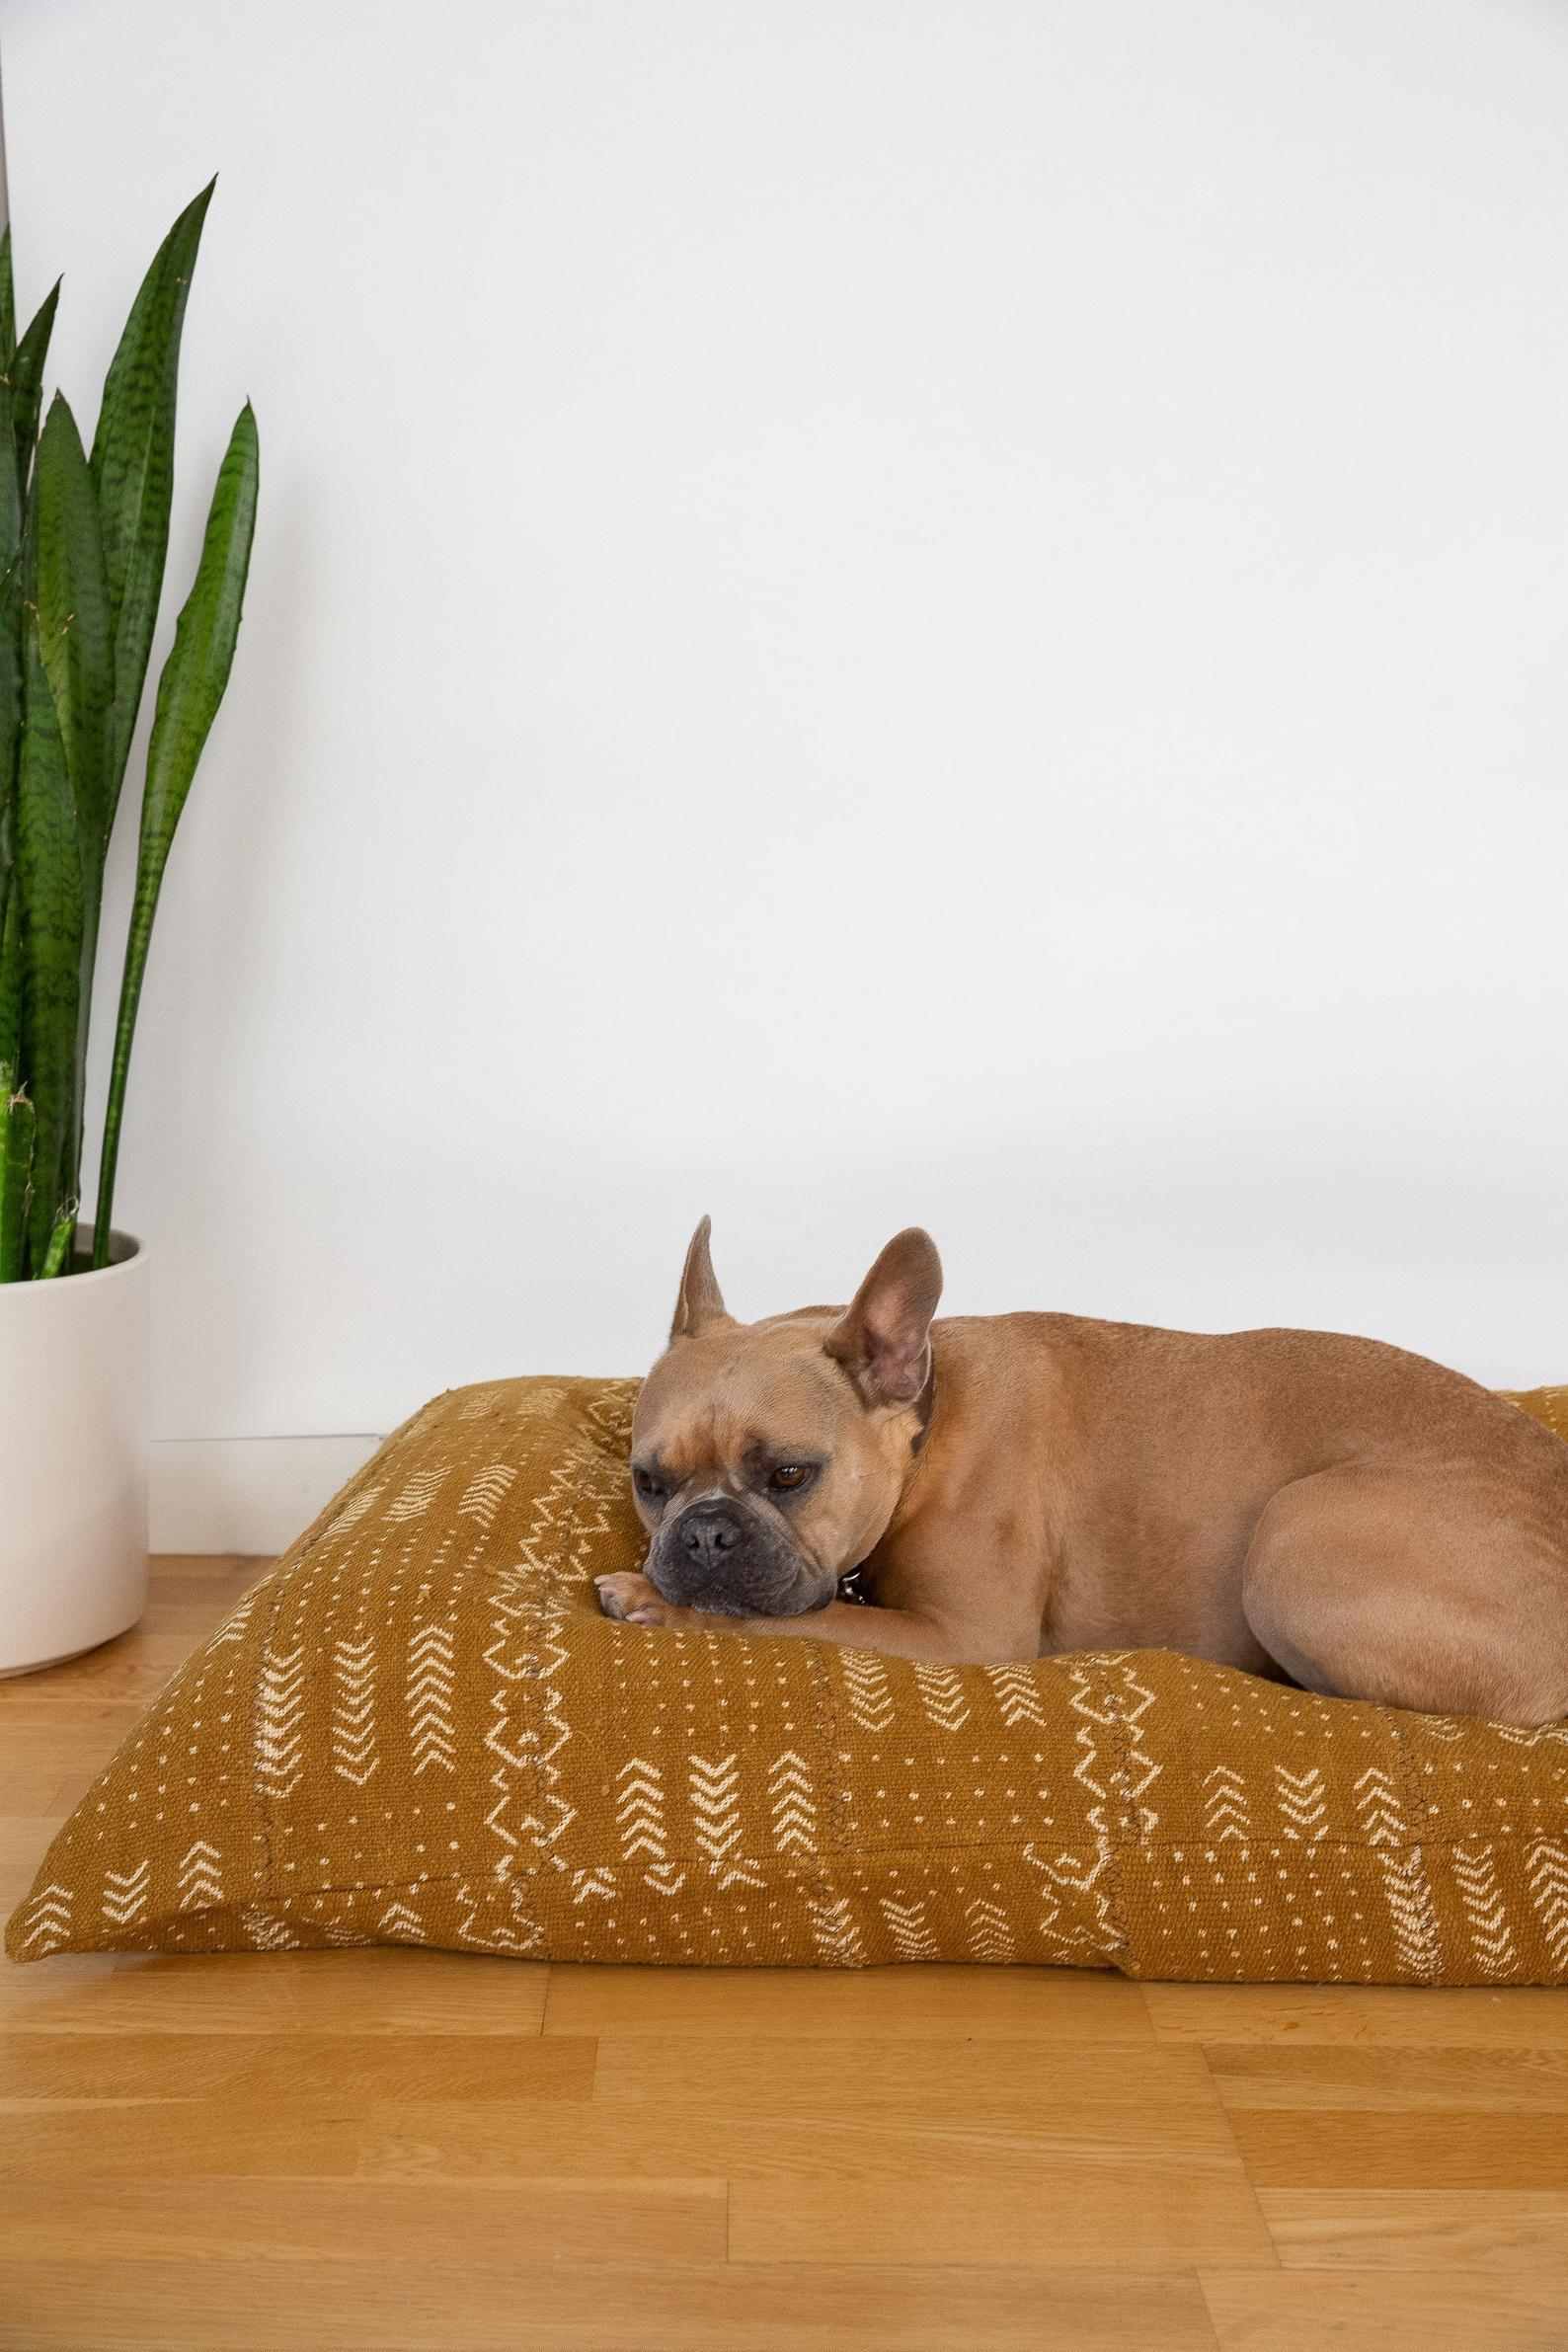 17 Stylish Boho Dog Beds You & Your Fur Kids Will Love - Mudcloth Dog bed cushion, French Bulldog.